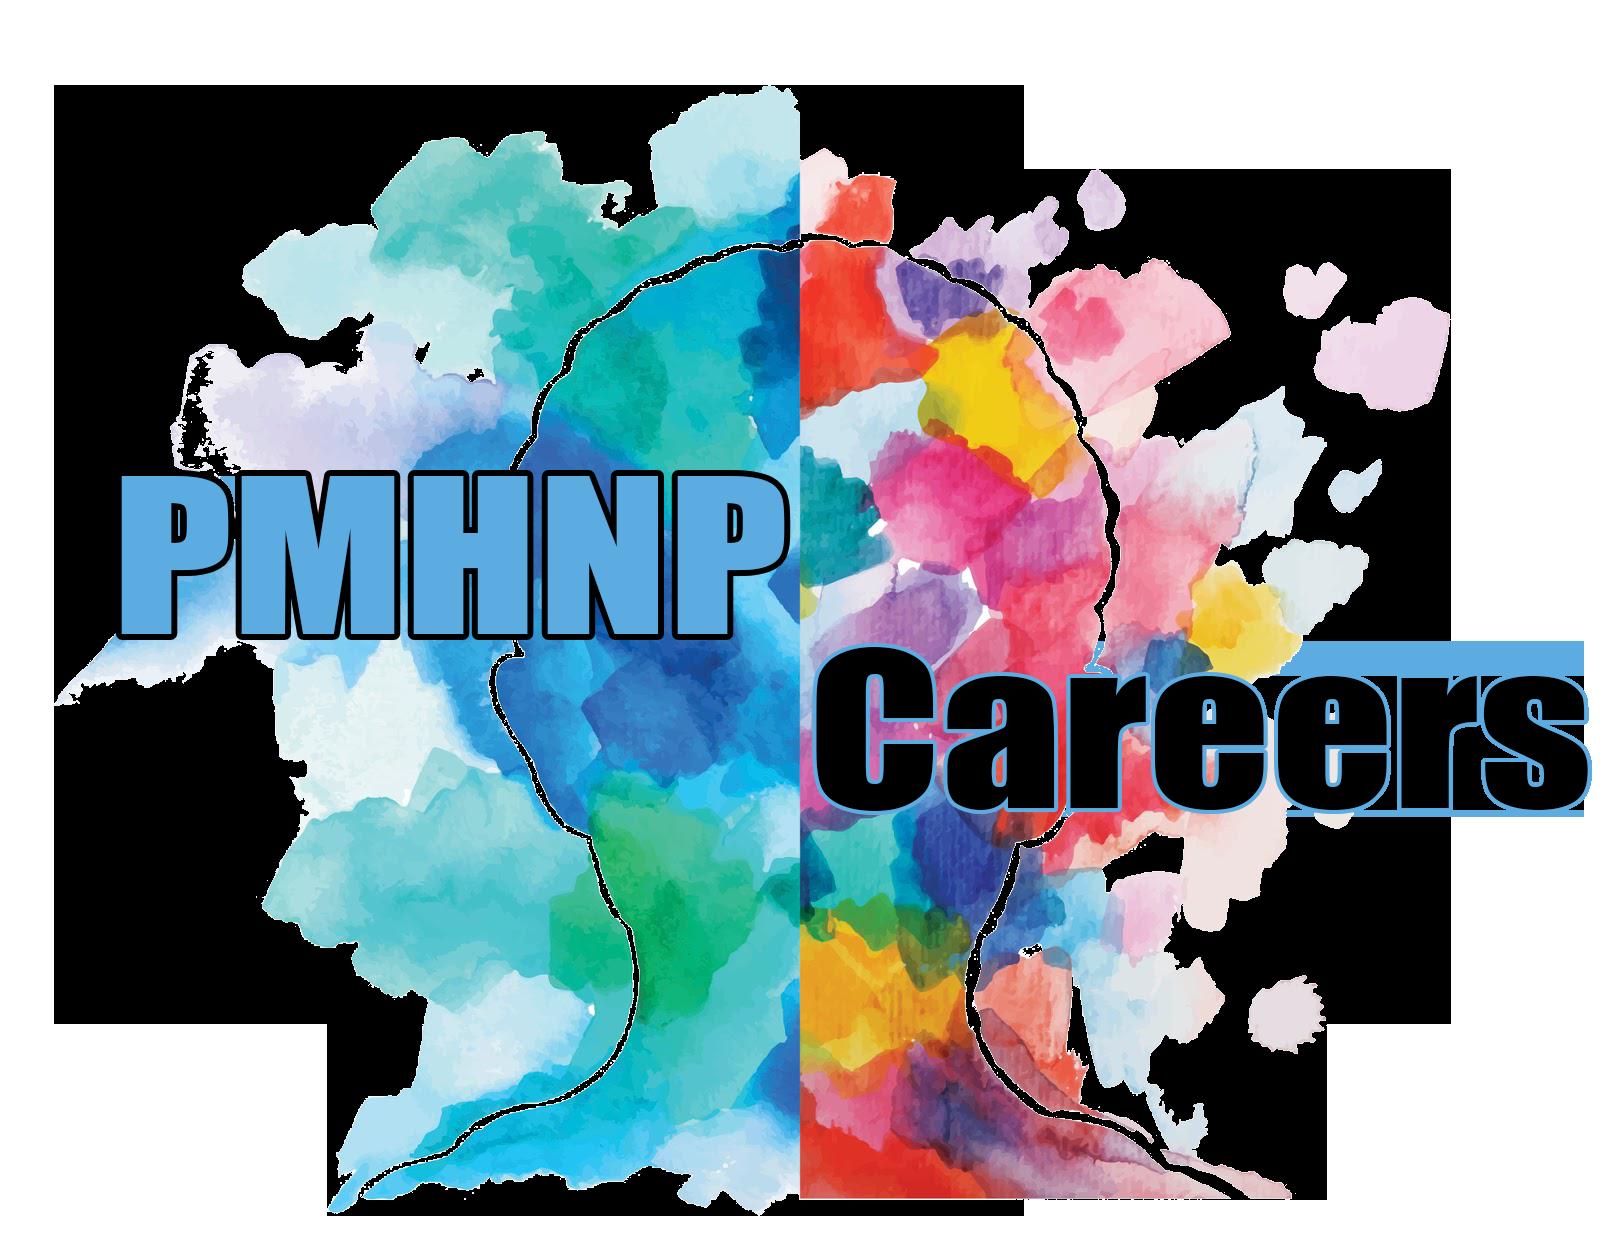 PMHNP Careers logo